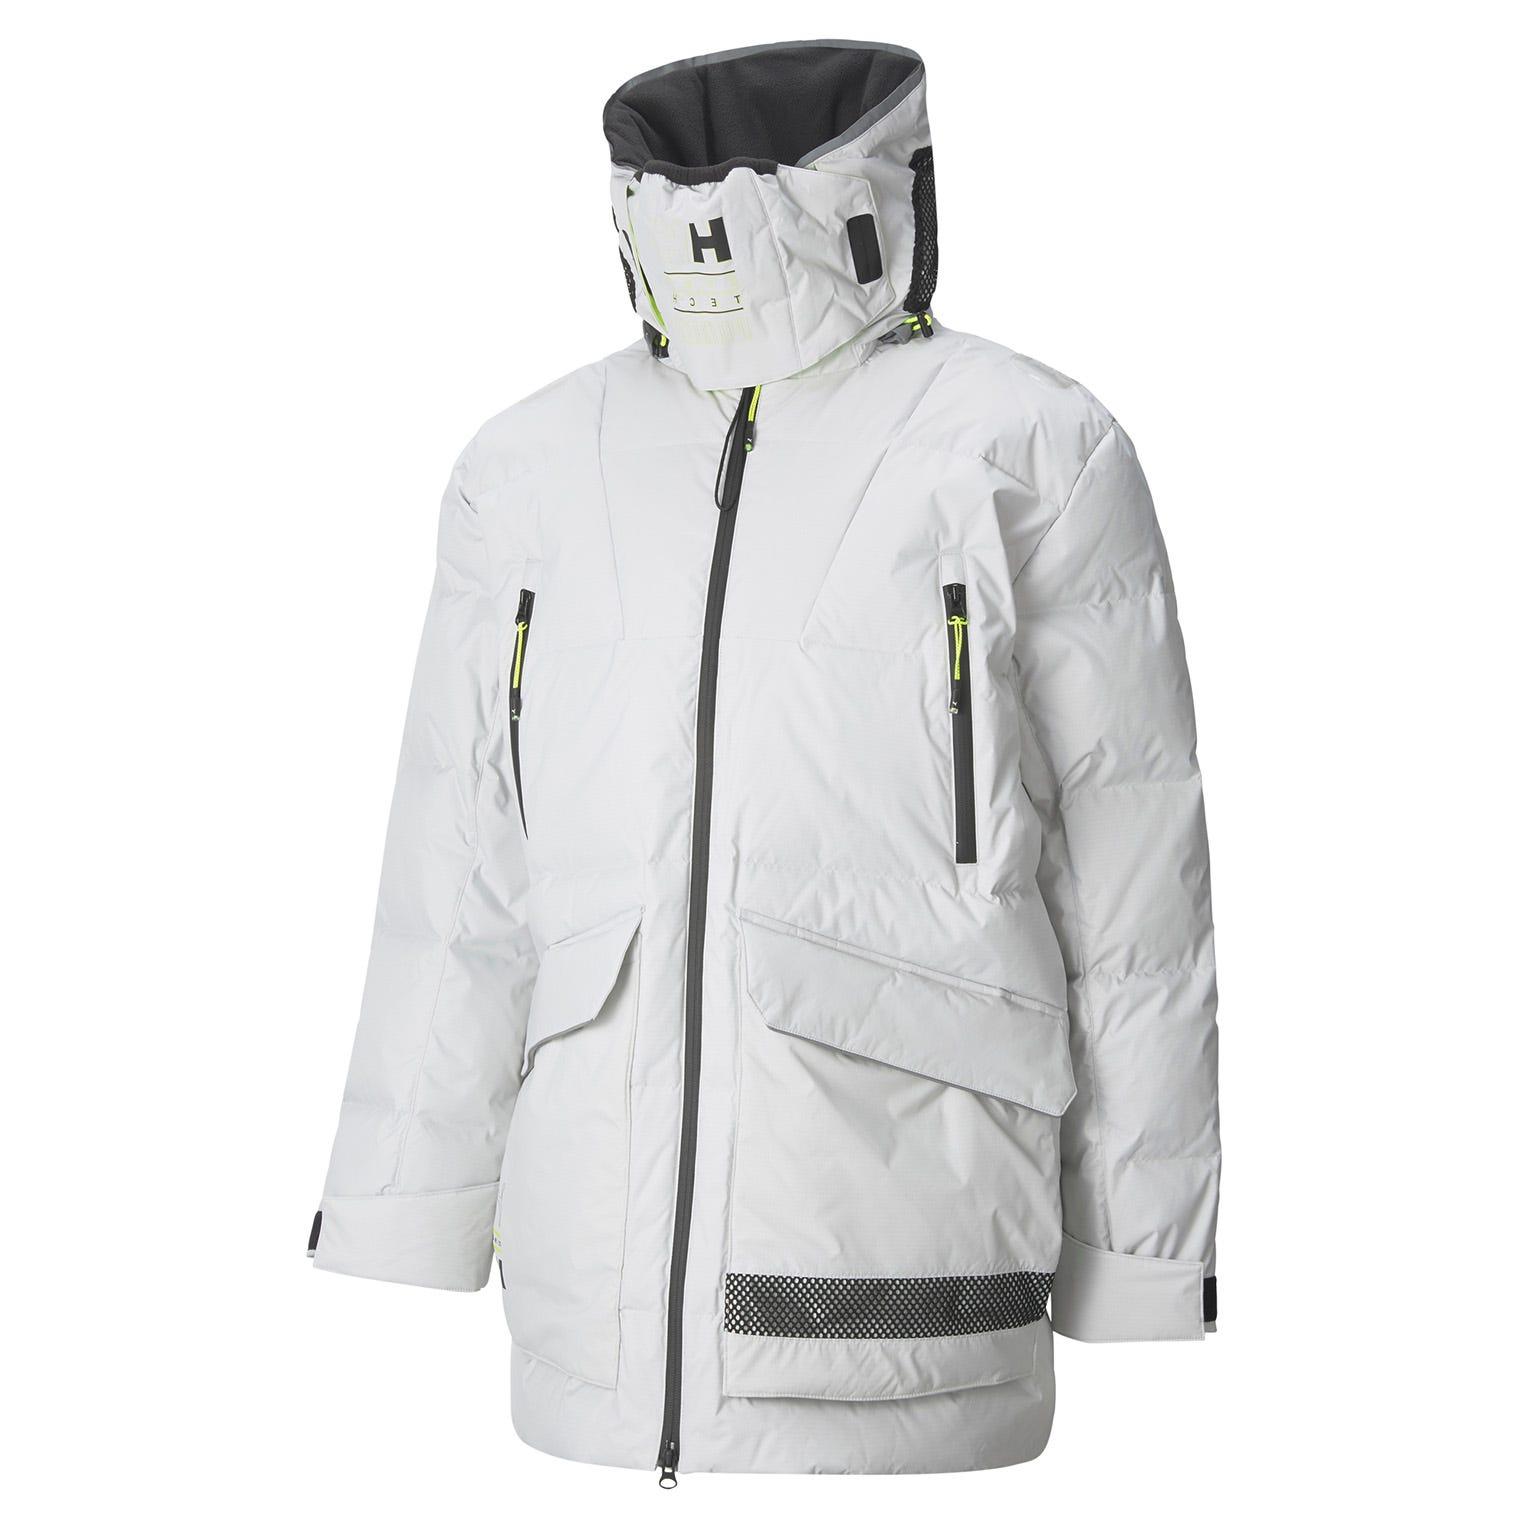 PUMA x HH Tech Winter Jacket